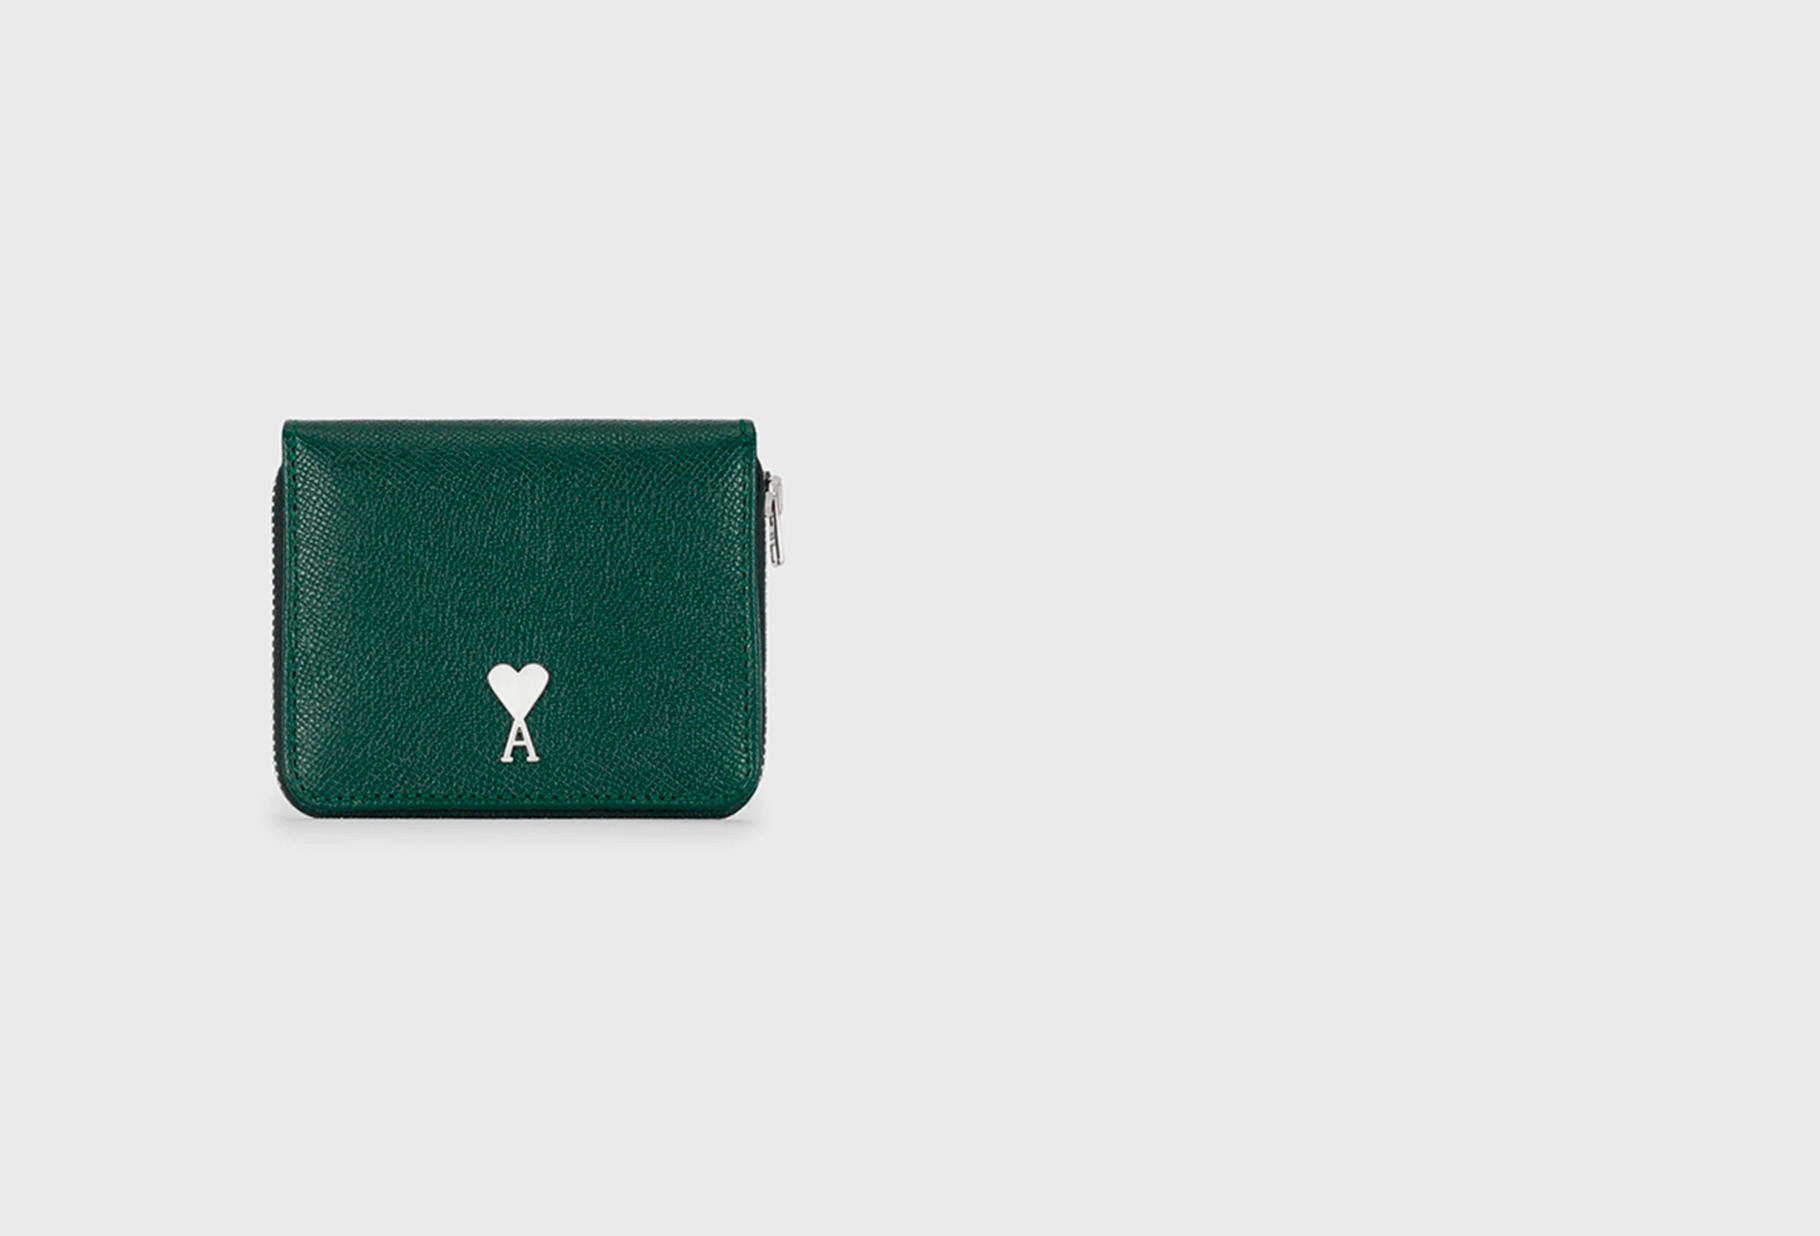 AMI / Portefeuille compact rivet ami Vert